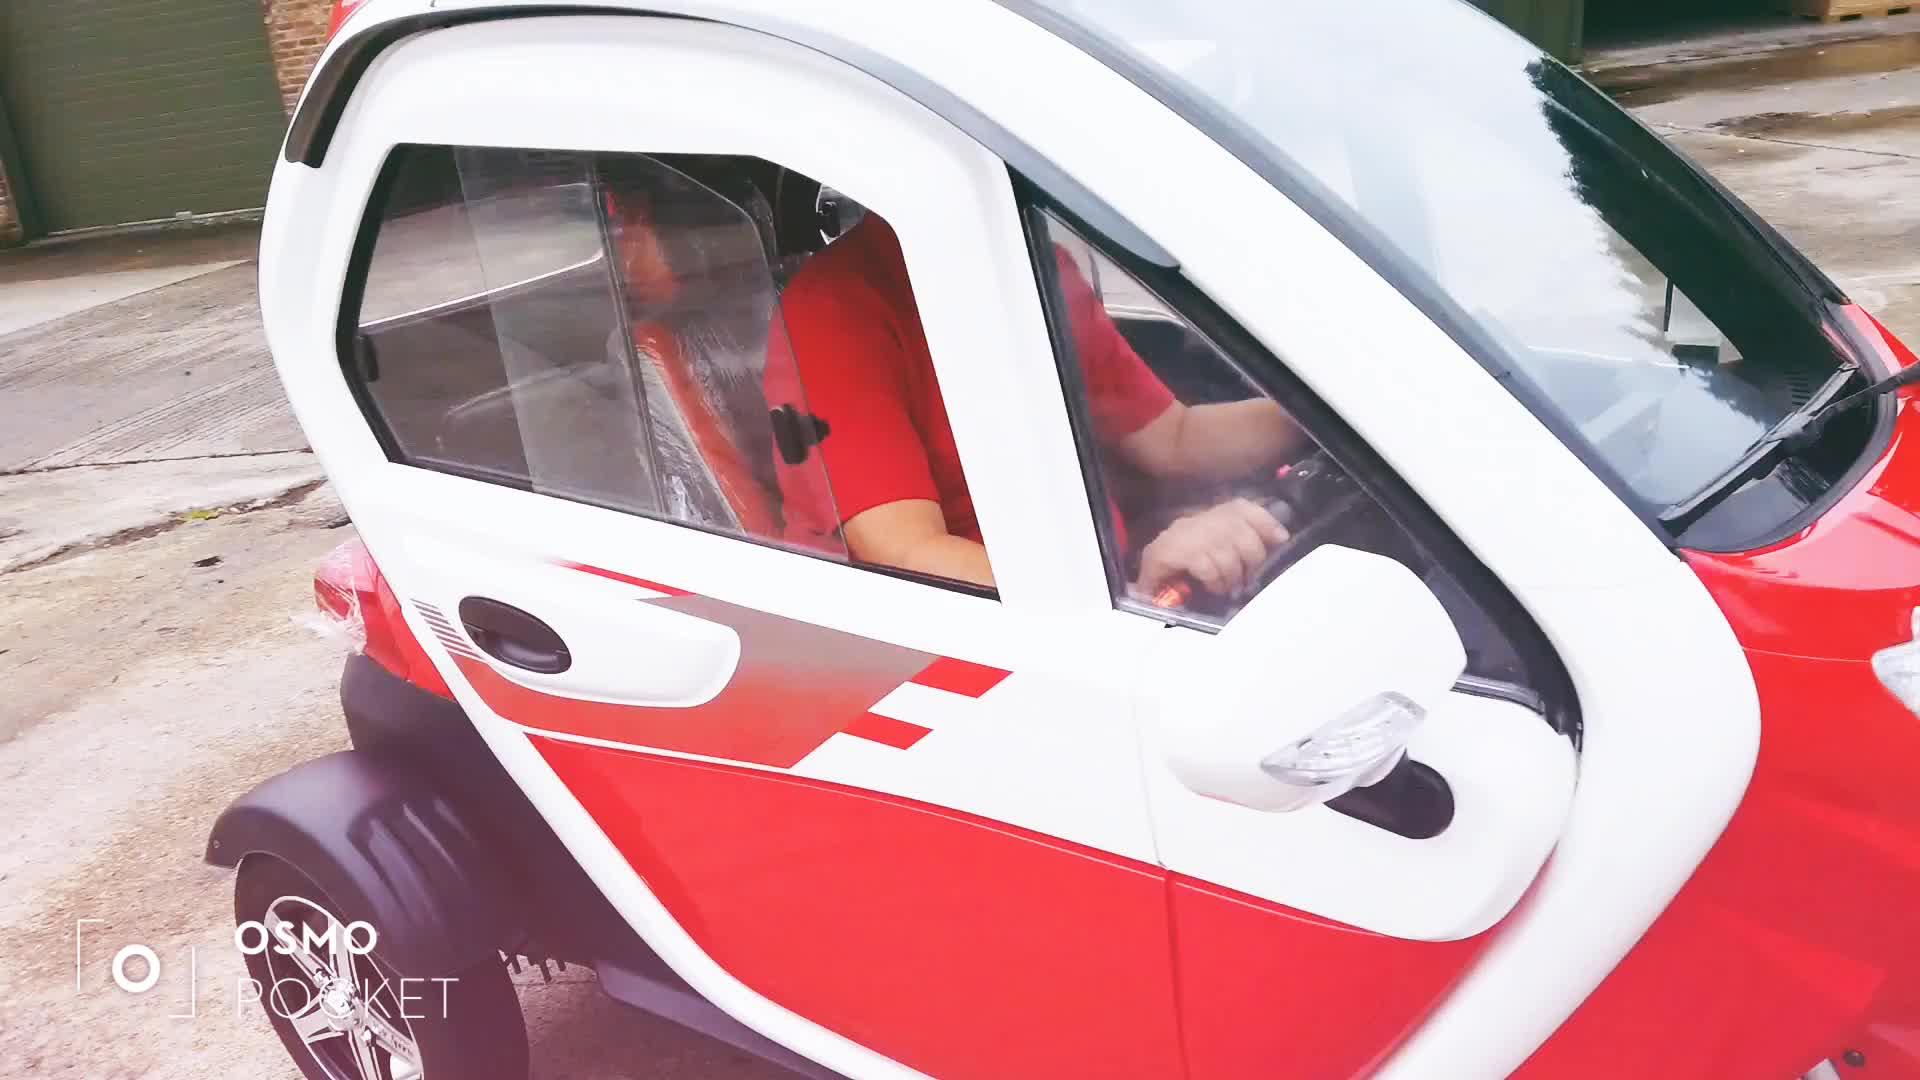 New energy ราคาถูก EEC รถ made in China, mini ไฟฟ้ารถสำหรับขาย/รถยนต์